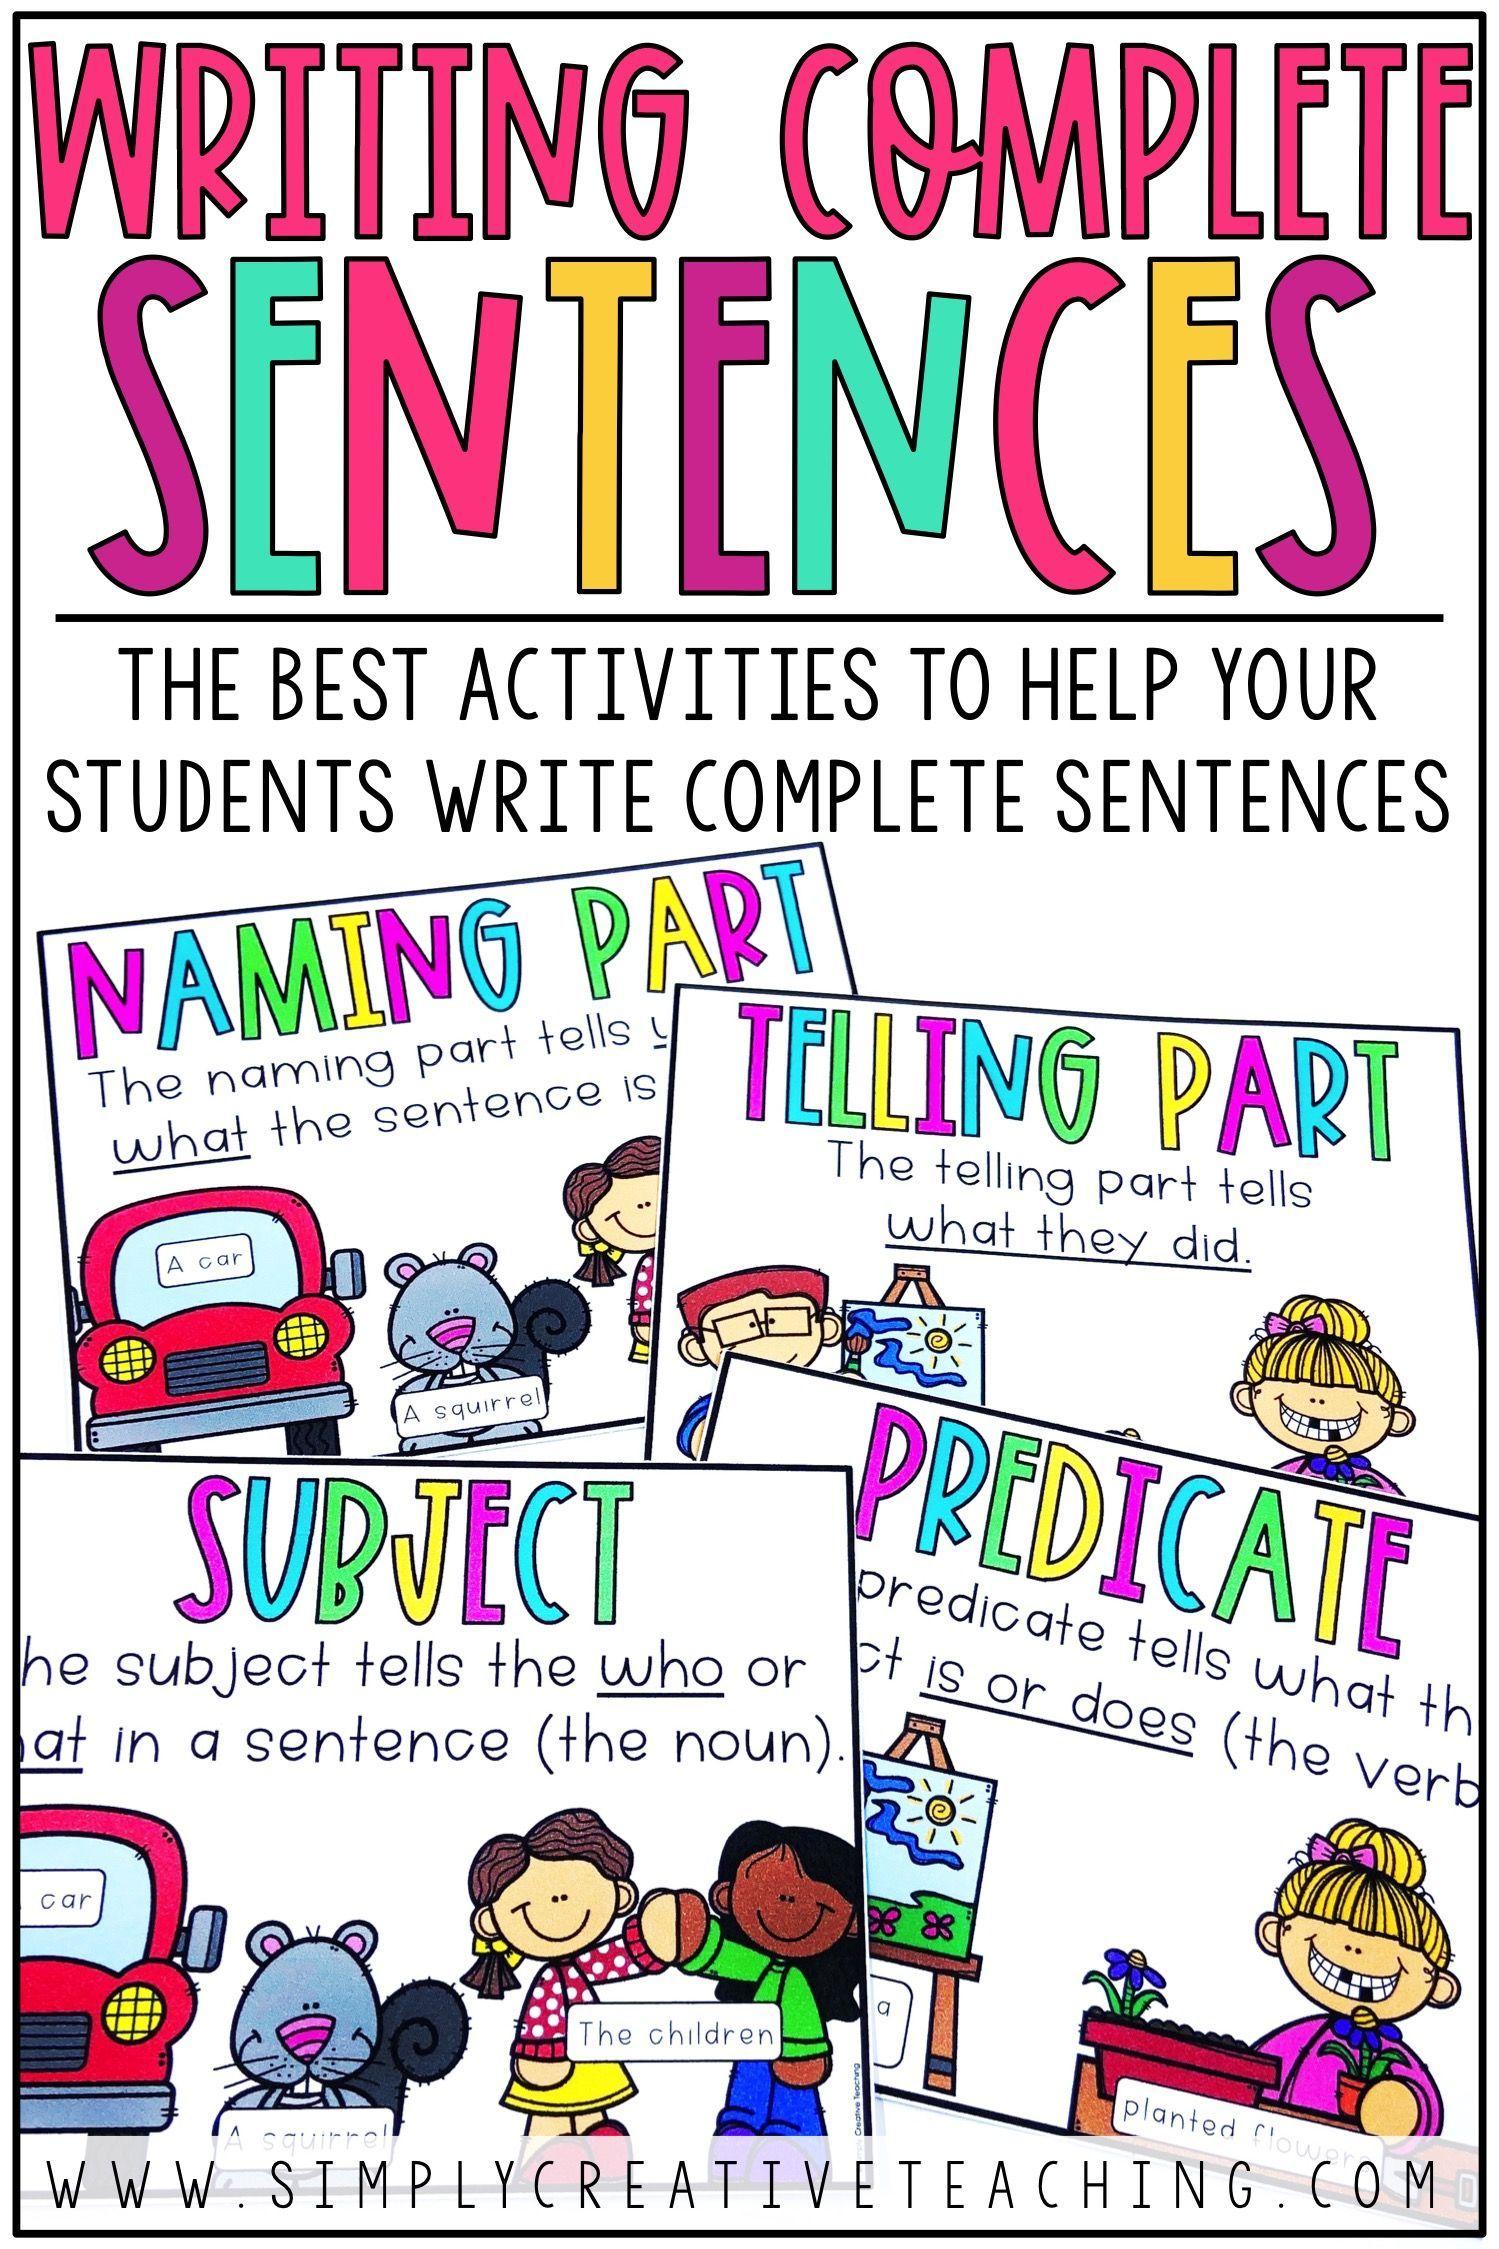 Writing Complete Sentences And Sentence Structure Distance Learning Writing Complete Sentences Teaching Sentences Sentence Activities